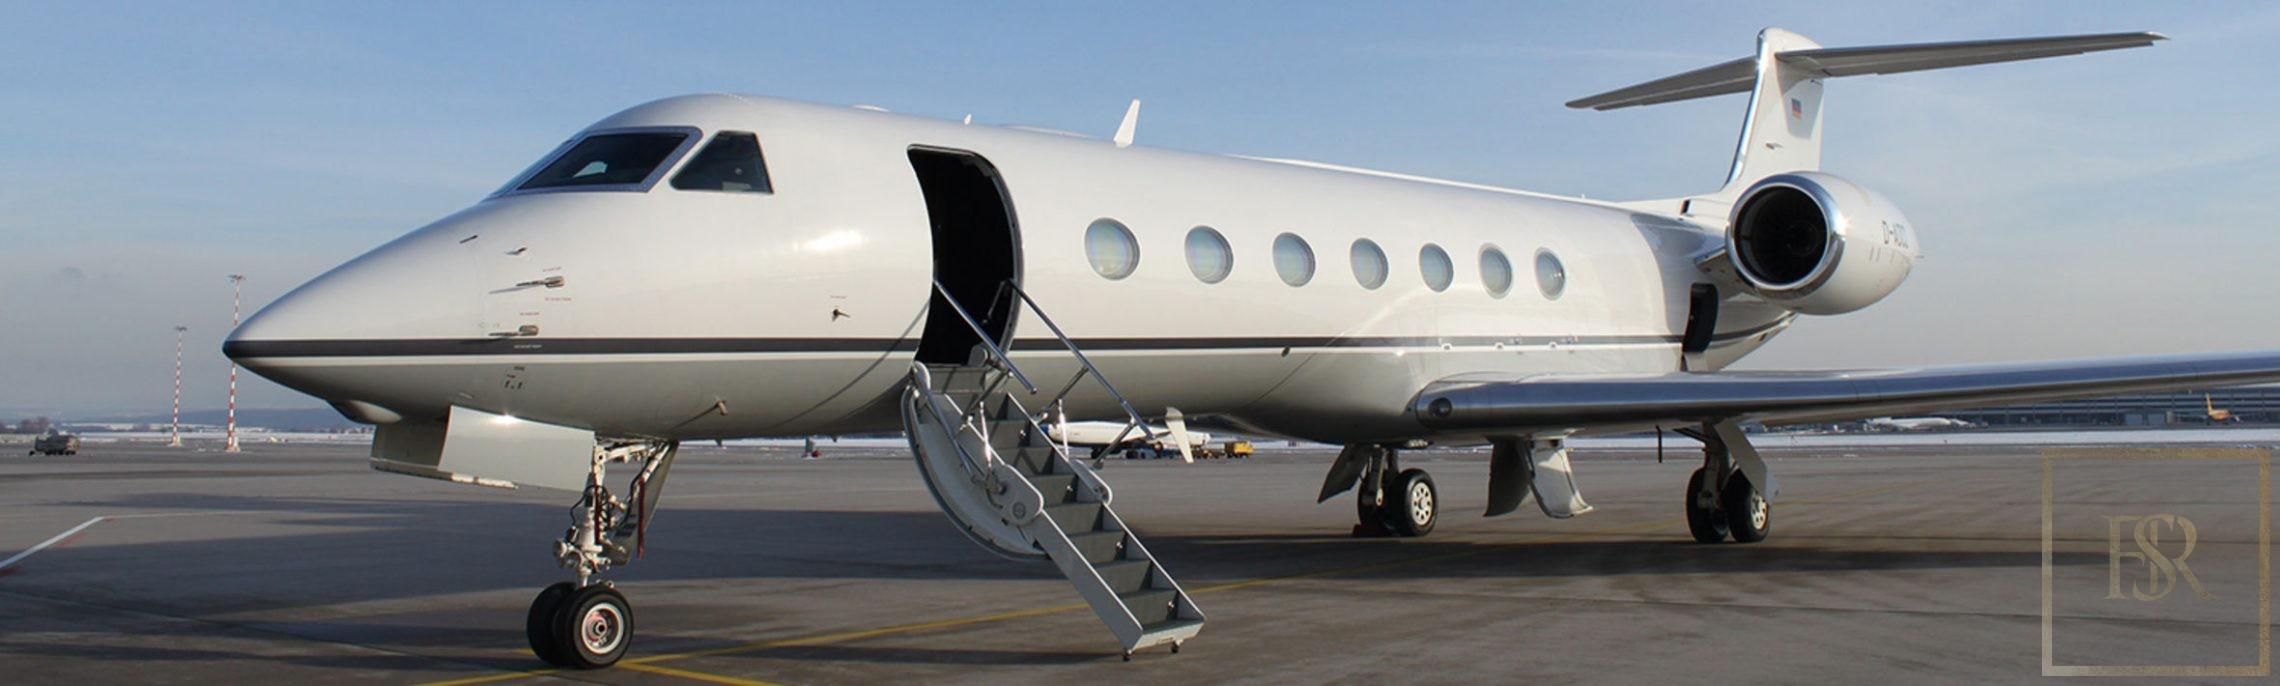 2013 GULFSTREAM  charter rental For Super Rich